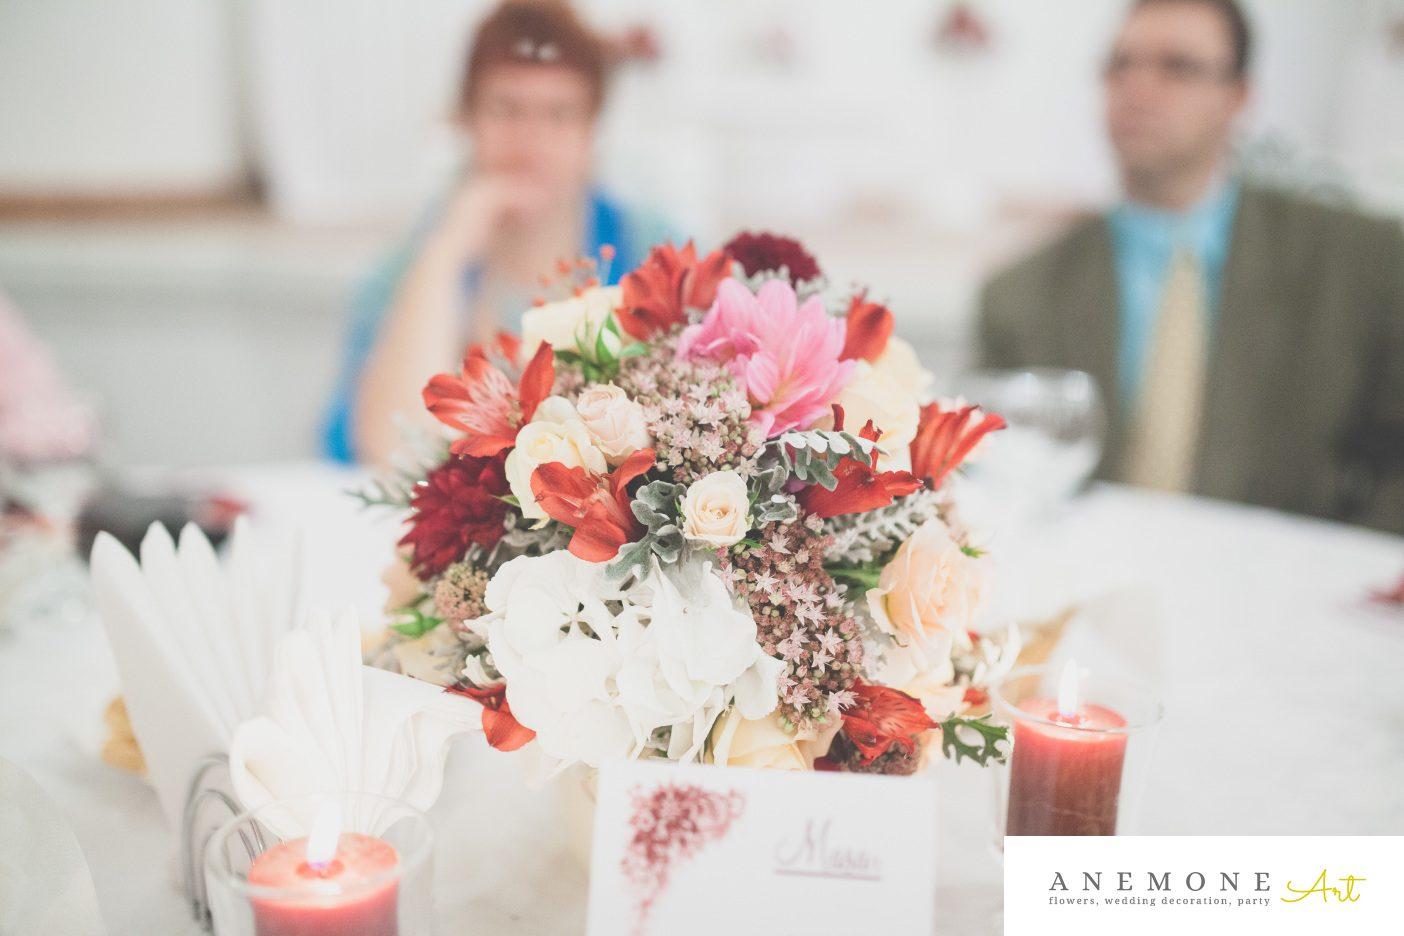 Poza, foto cu Flori de nunta bordo, decor masa, rosu in Arad, Timisoara, Oradea (wedding flowers, bouquets) nunta Arad, Timisoara, Oradea